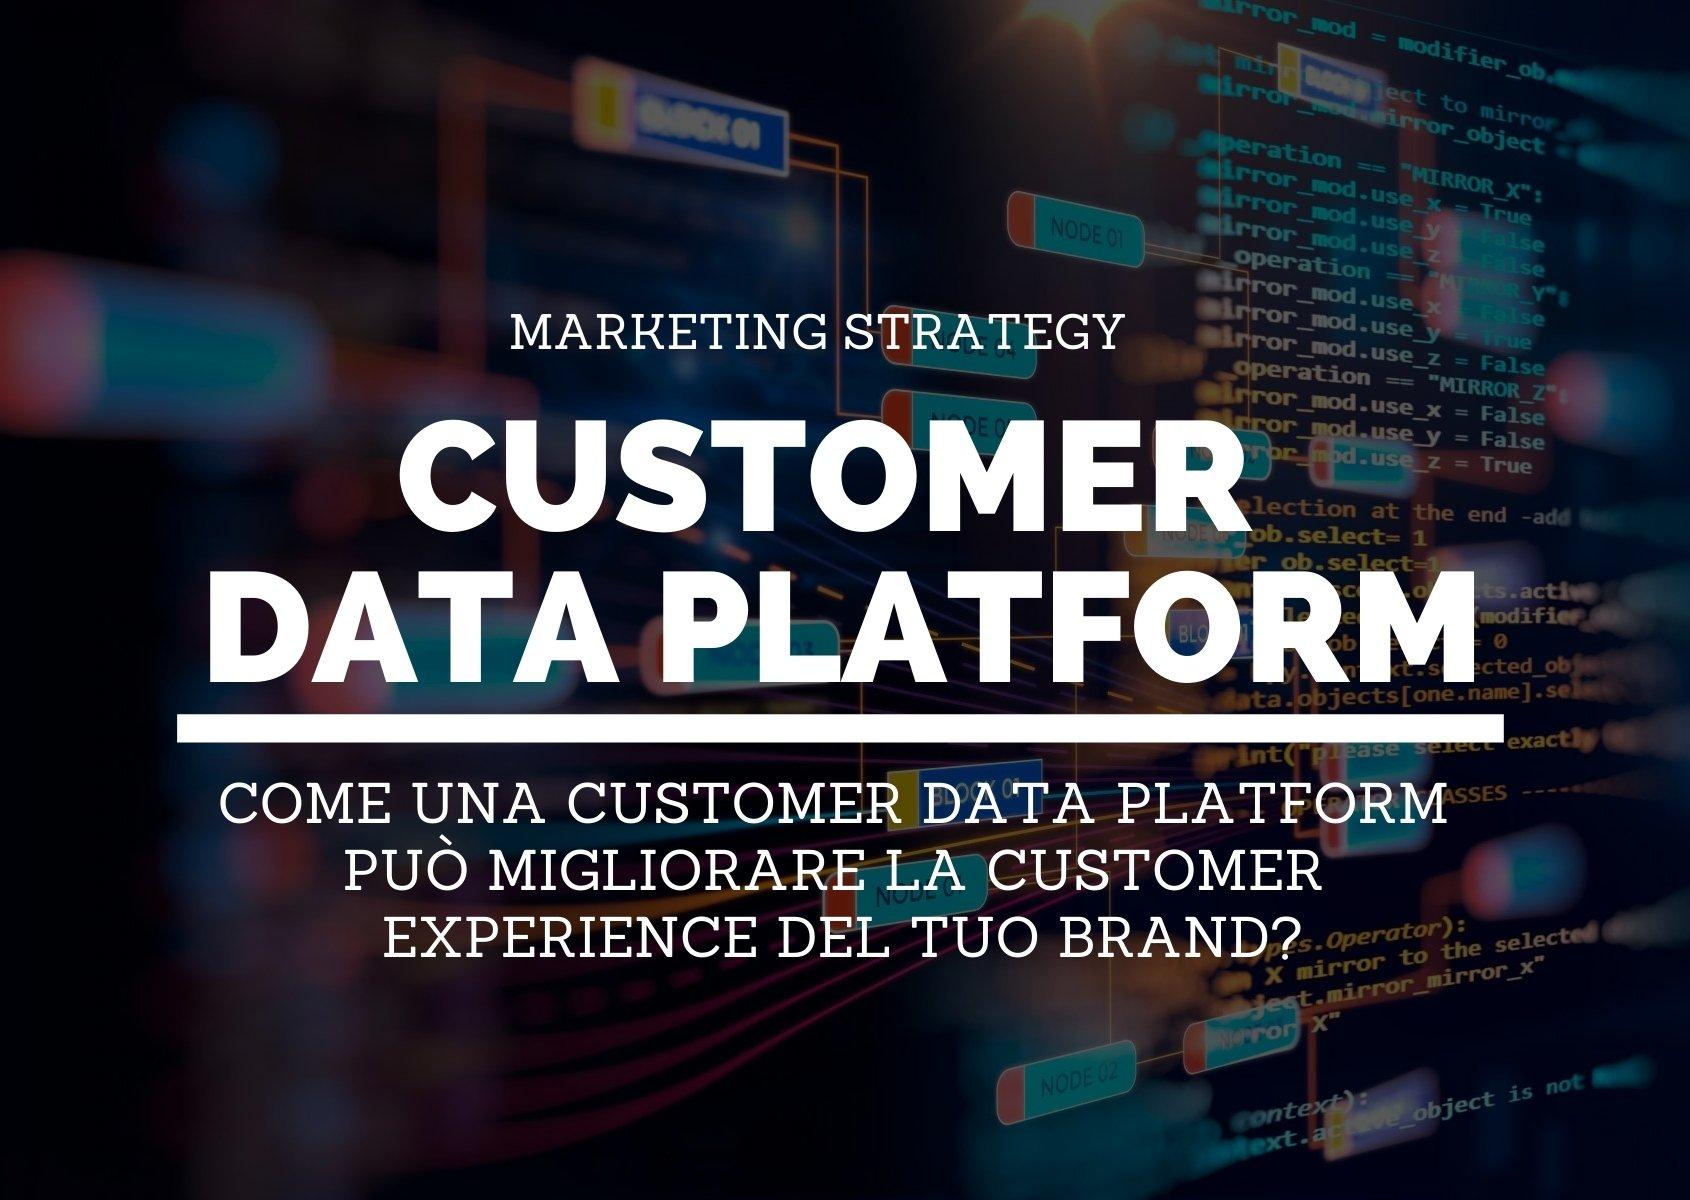 customer-data-platform-6